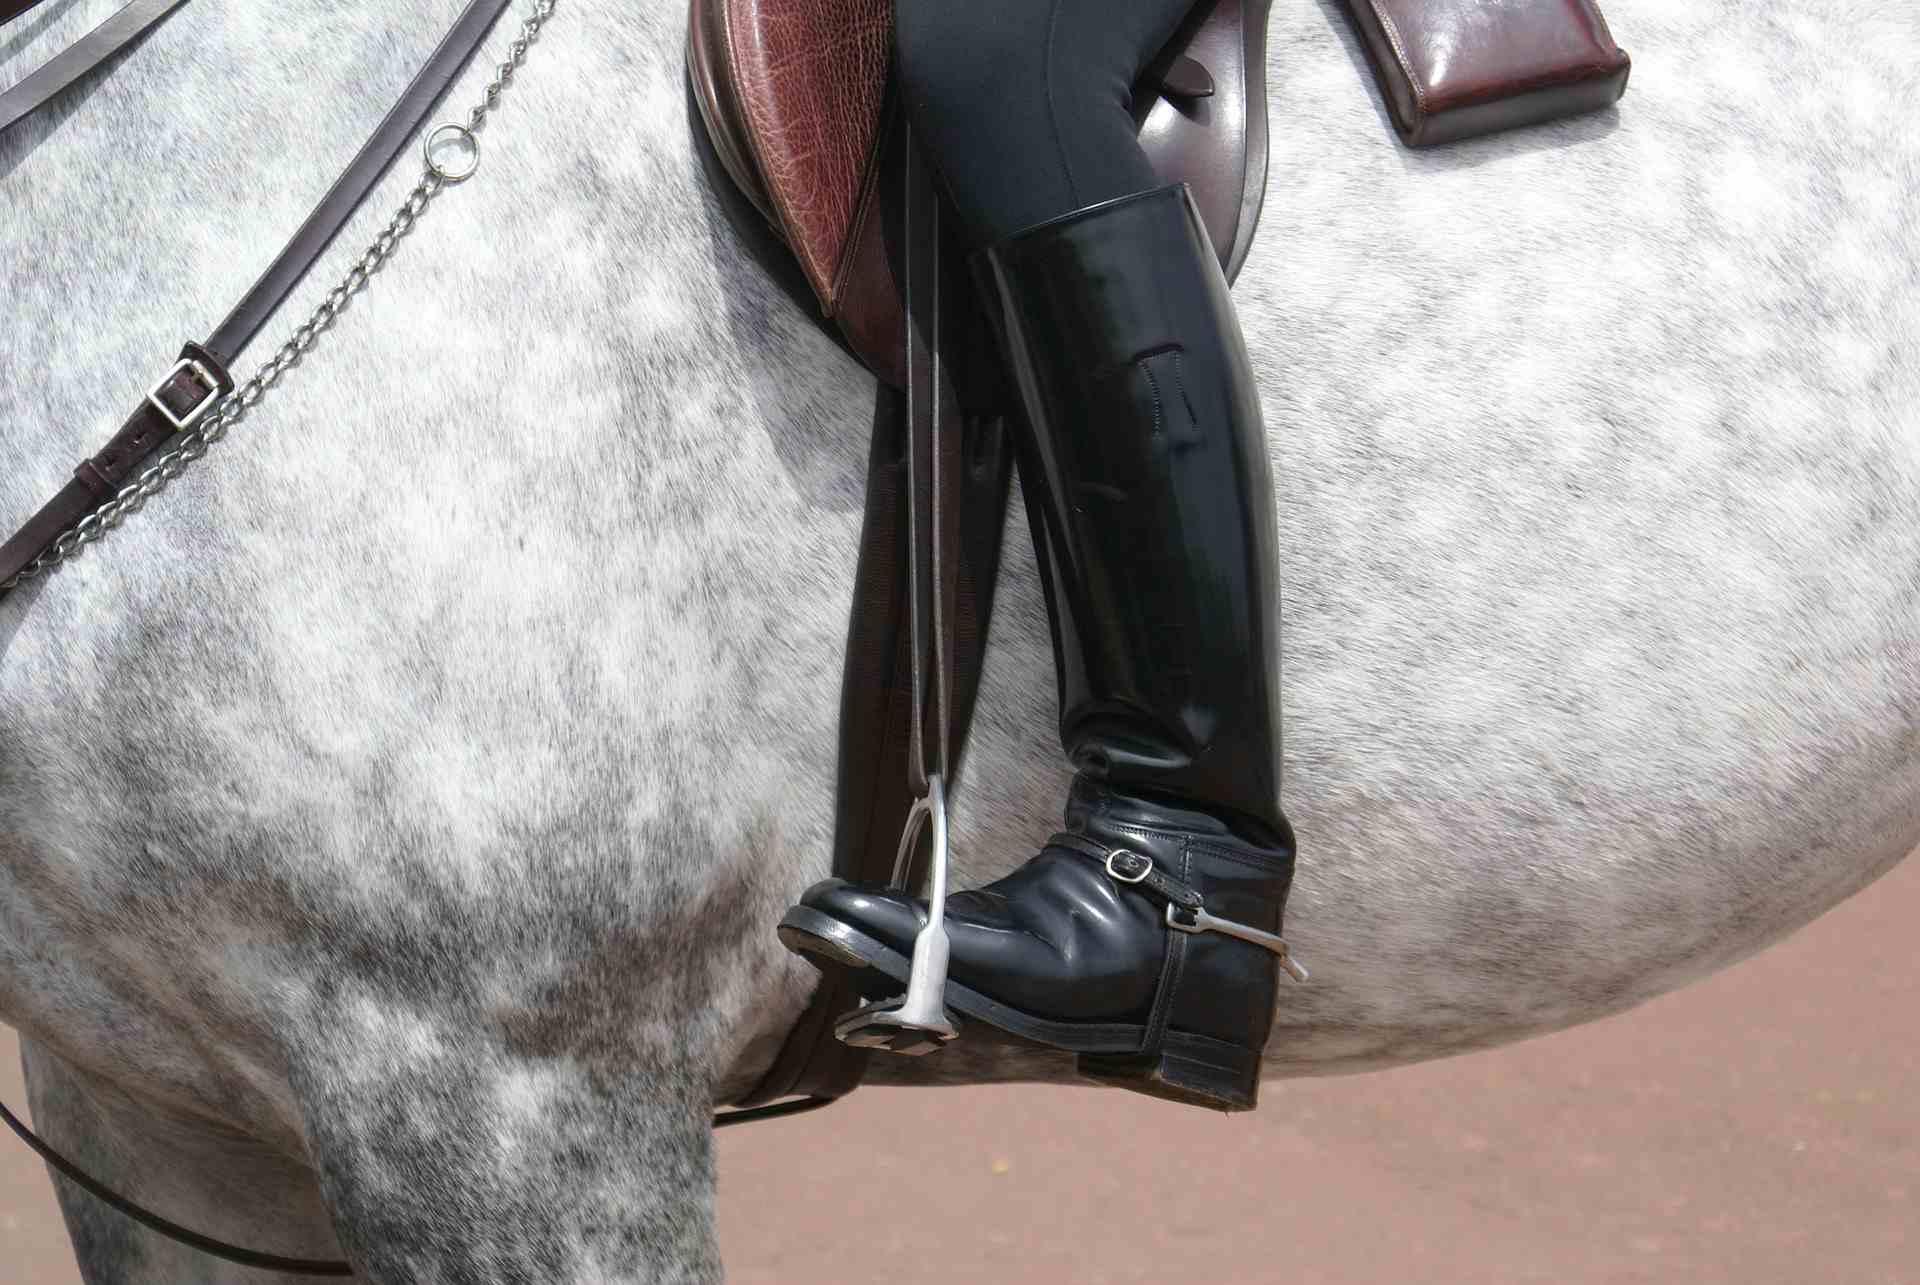 Close up of Rider's Leg With English Tack